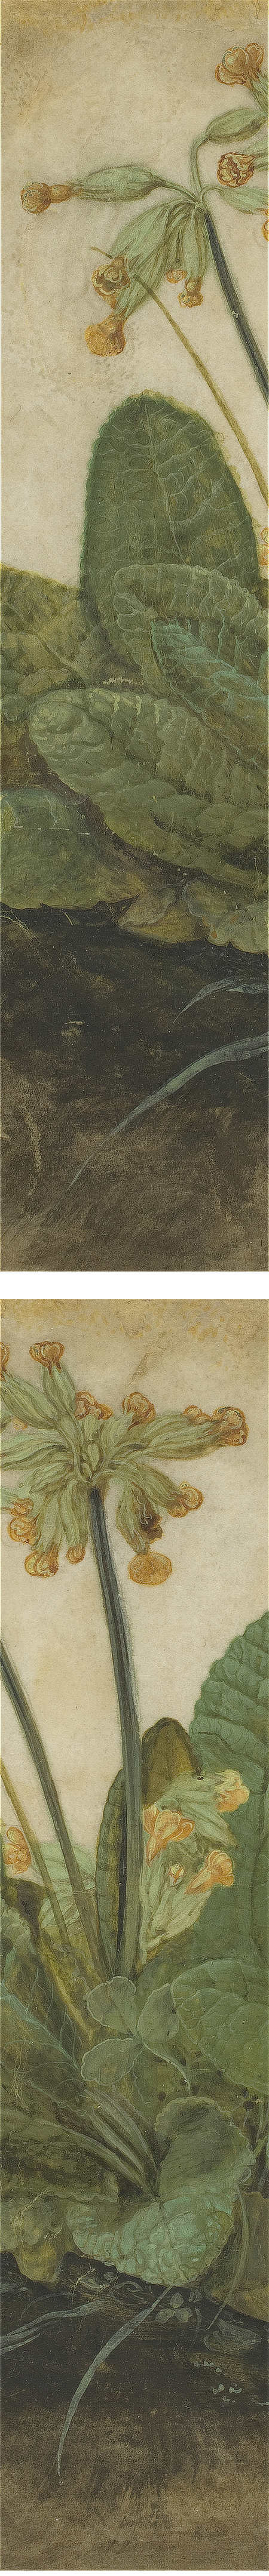 Tuft of Cowslips, Albrecht Durer, gouache on vellum (details)